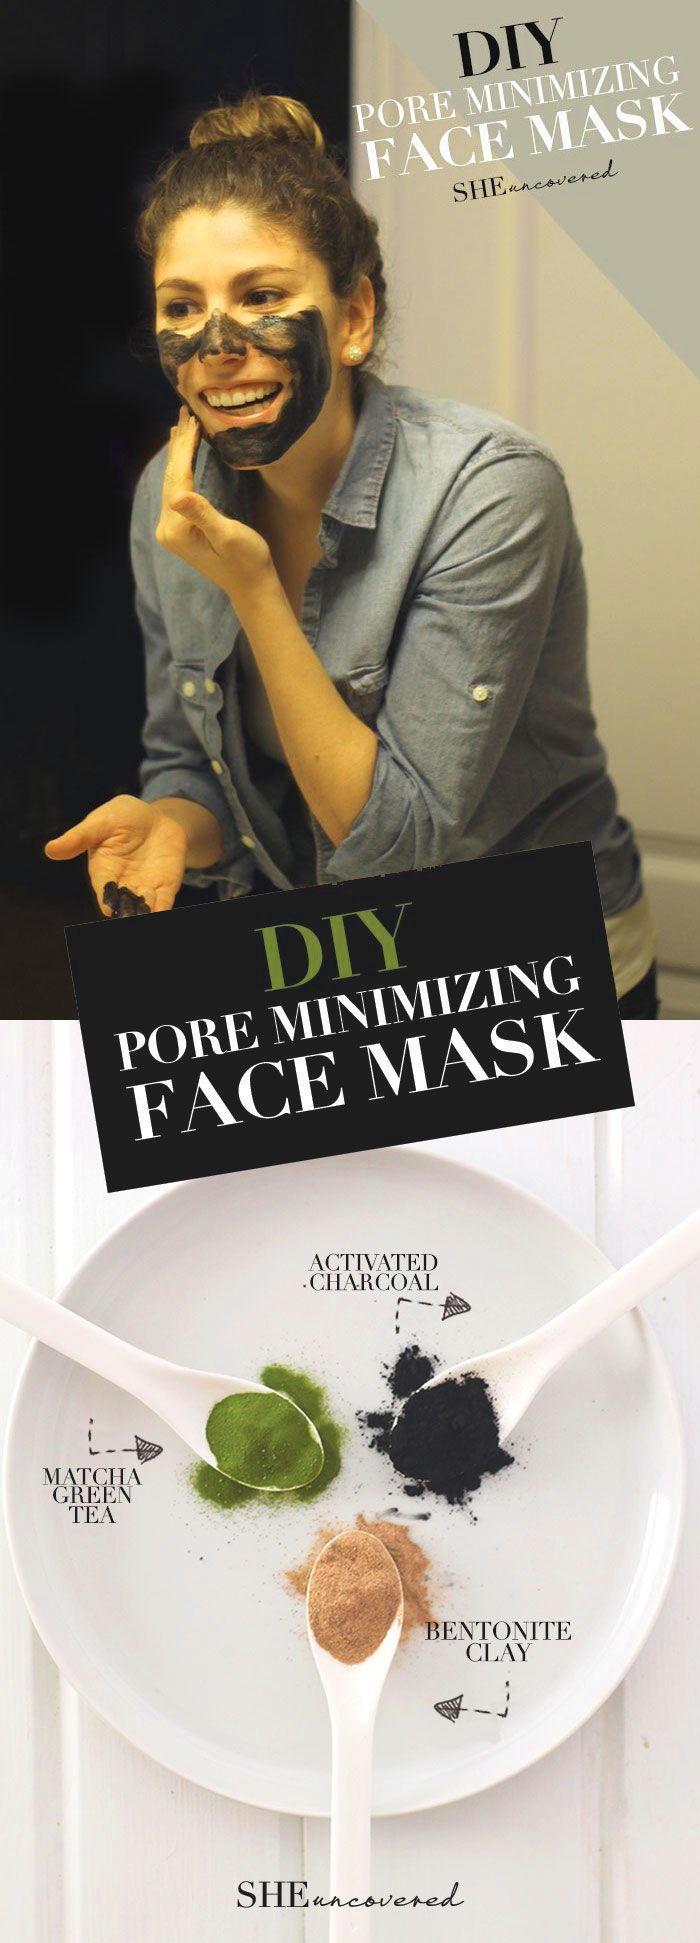 DIY Pore Minimizing Face Mask | #Homemade #Face_Mask Recipes for Beautiful #Skin